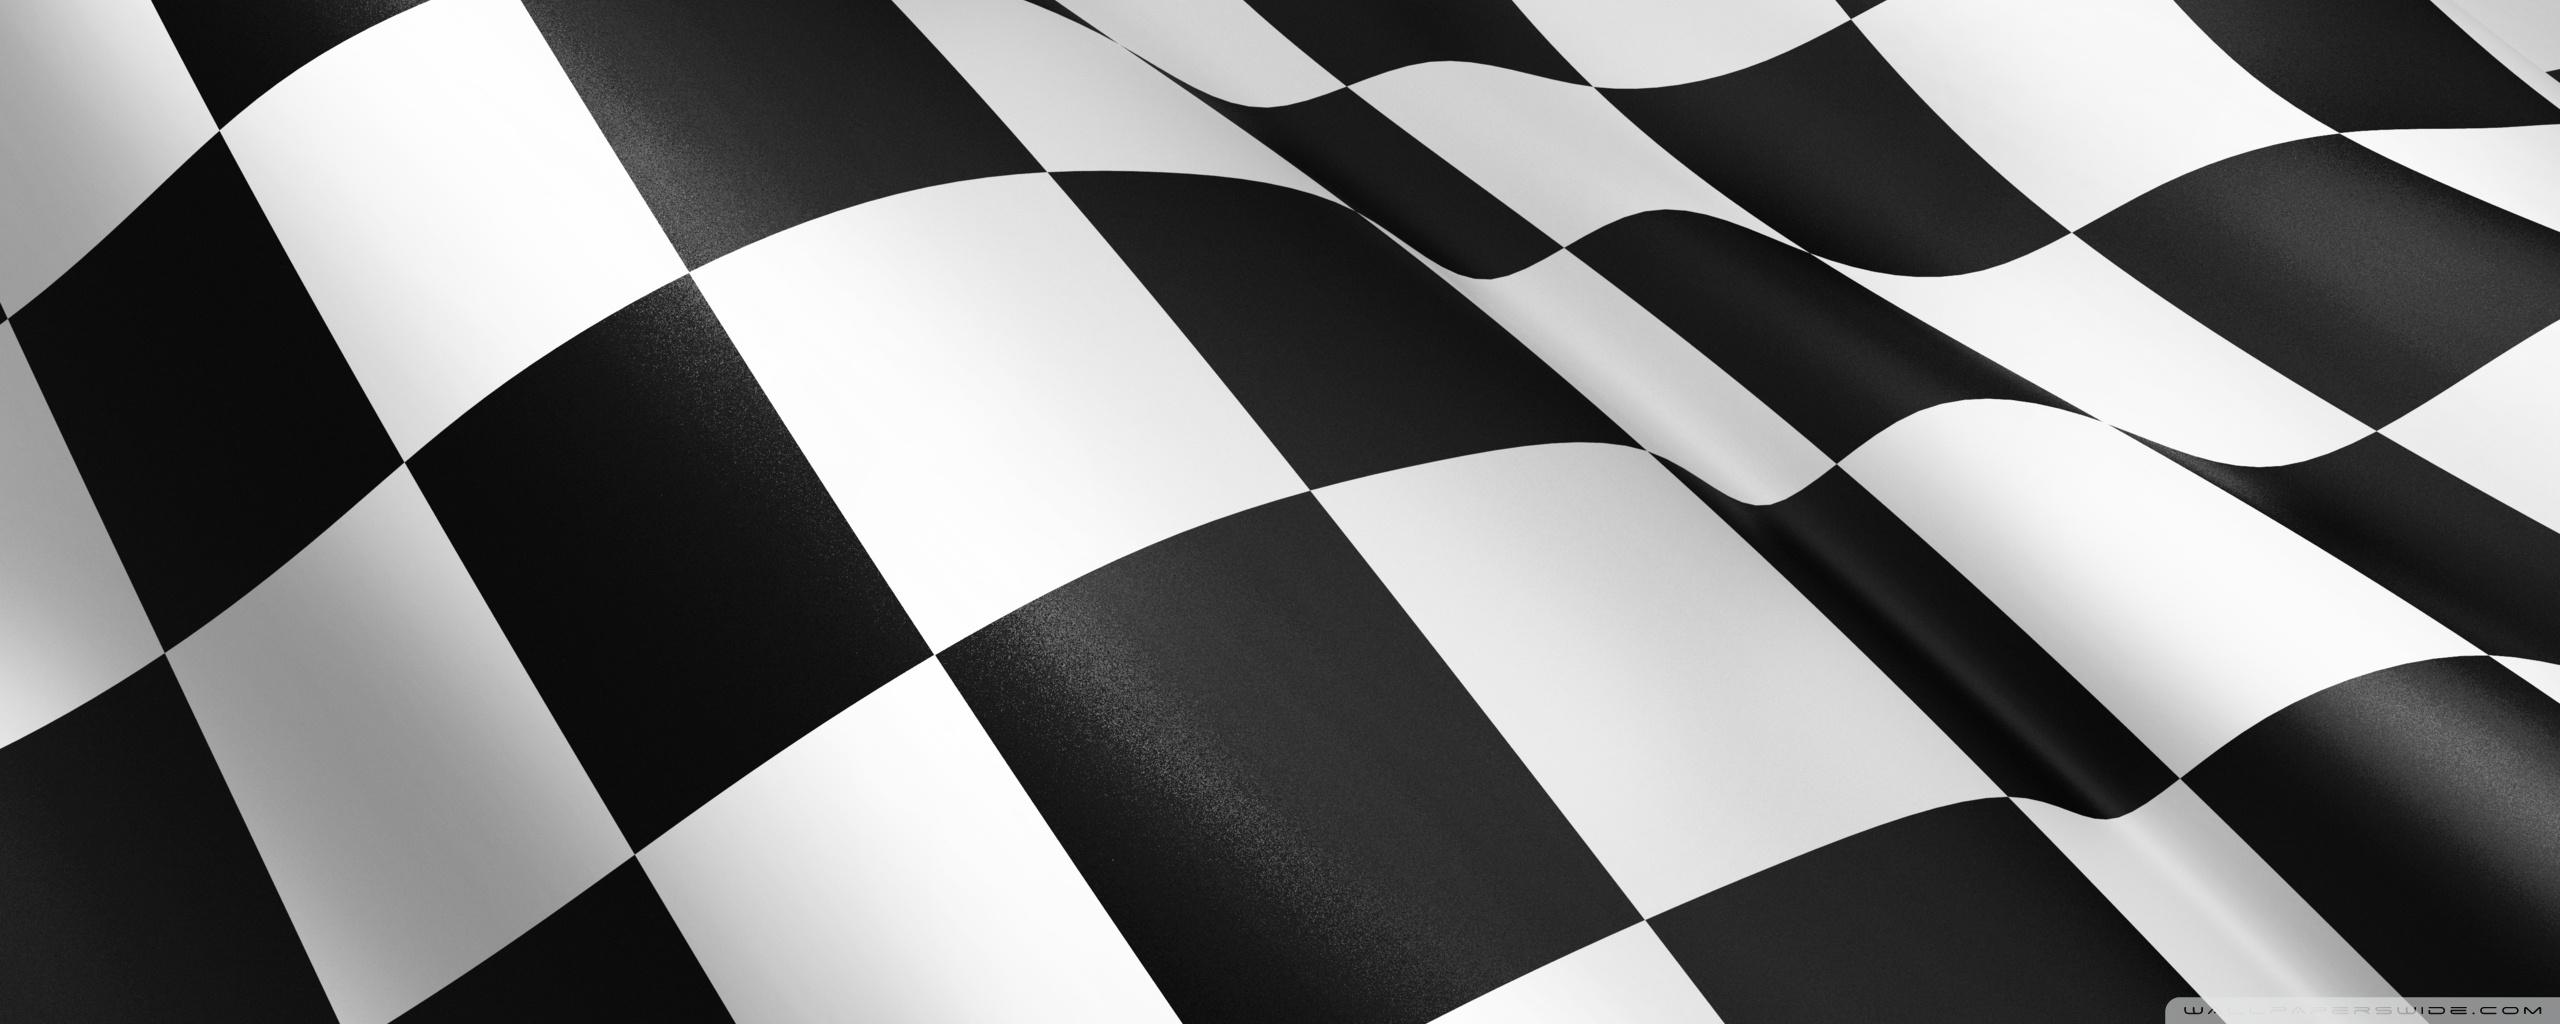 Racing Flag 4K HD Desktop Wallpaper for 4K Ultra HD TV Dual 2560x1024